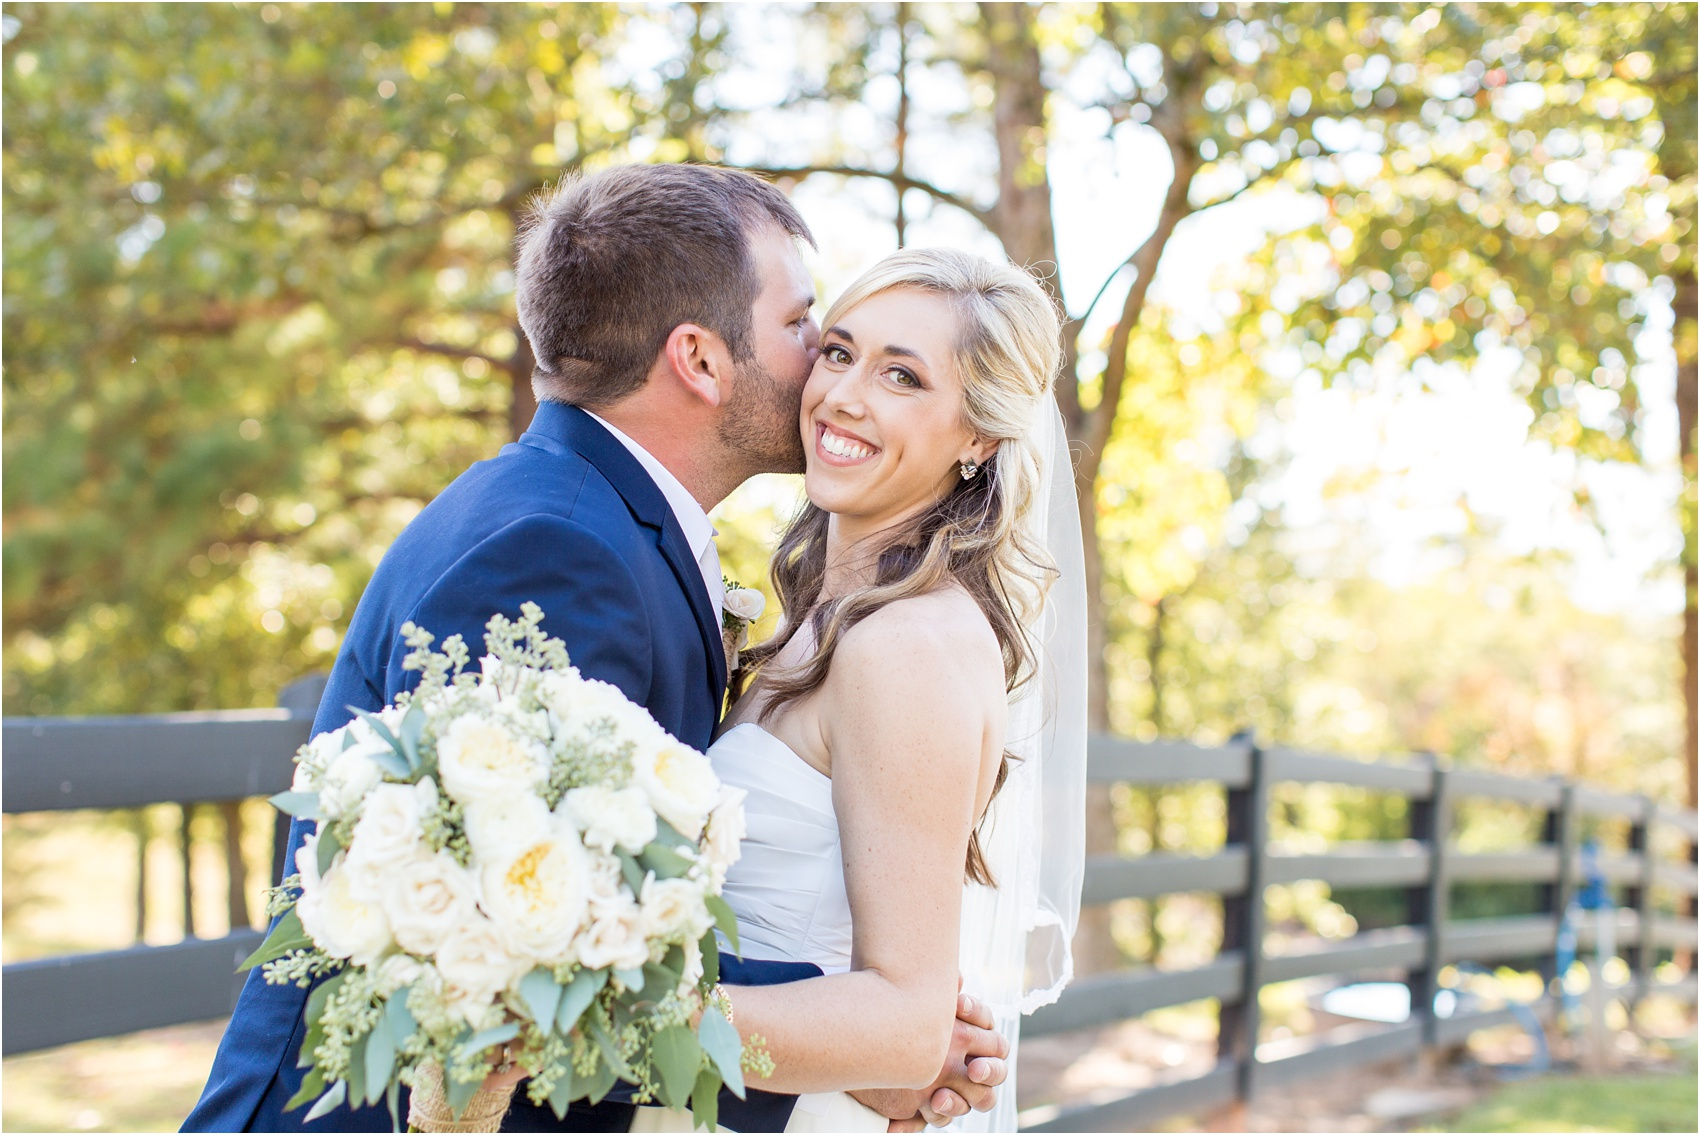 Savannah Eve Photography- Spencer Wedding- Blog-18.jpg